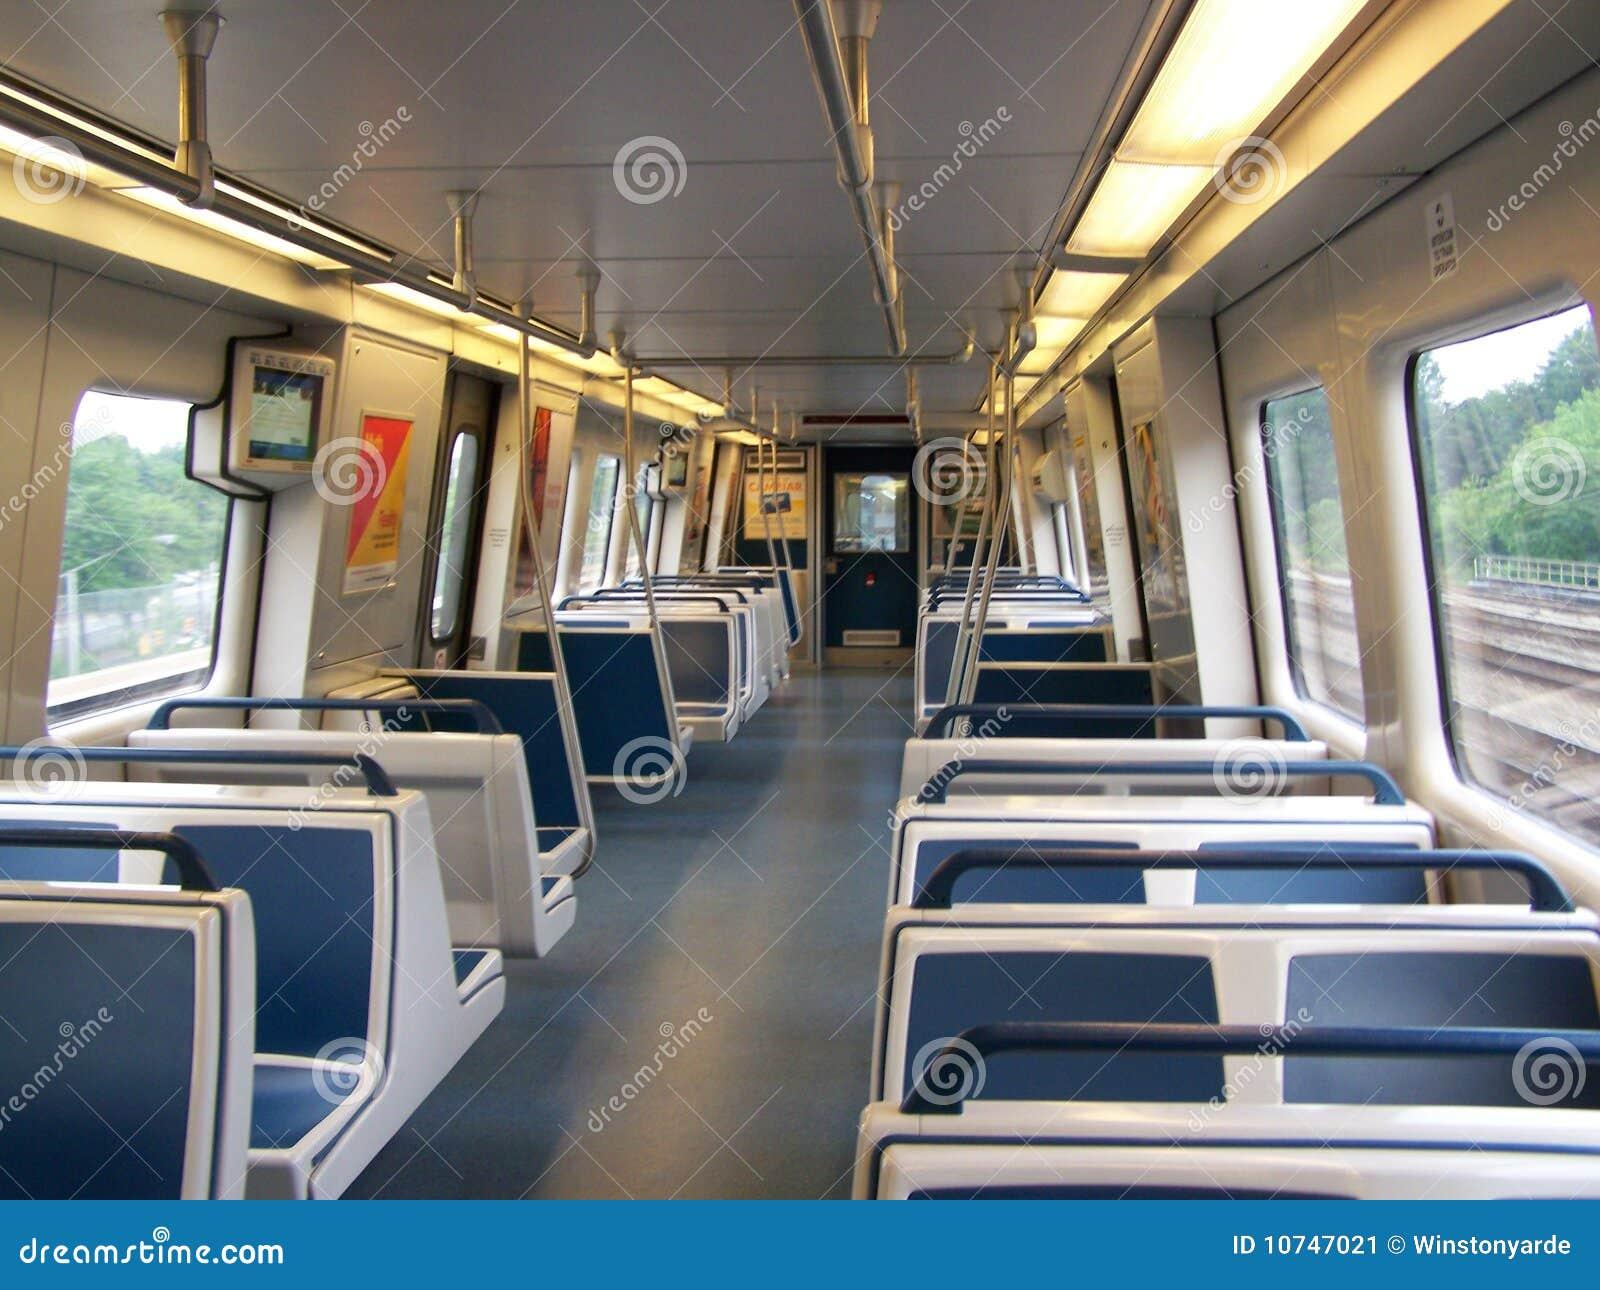 atlanta marta new train interior stock image image 10747021. Black Bedroom Furniture Sets. Home Design Ideas